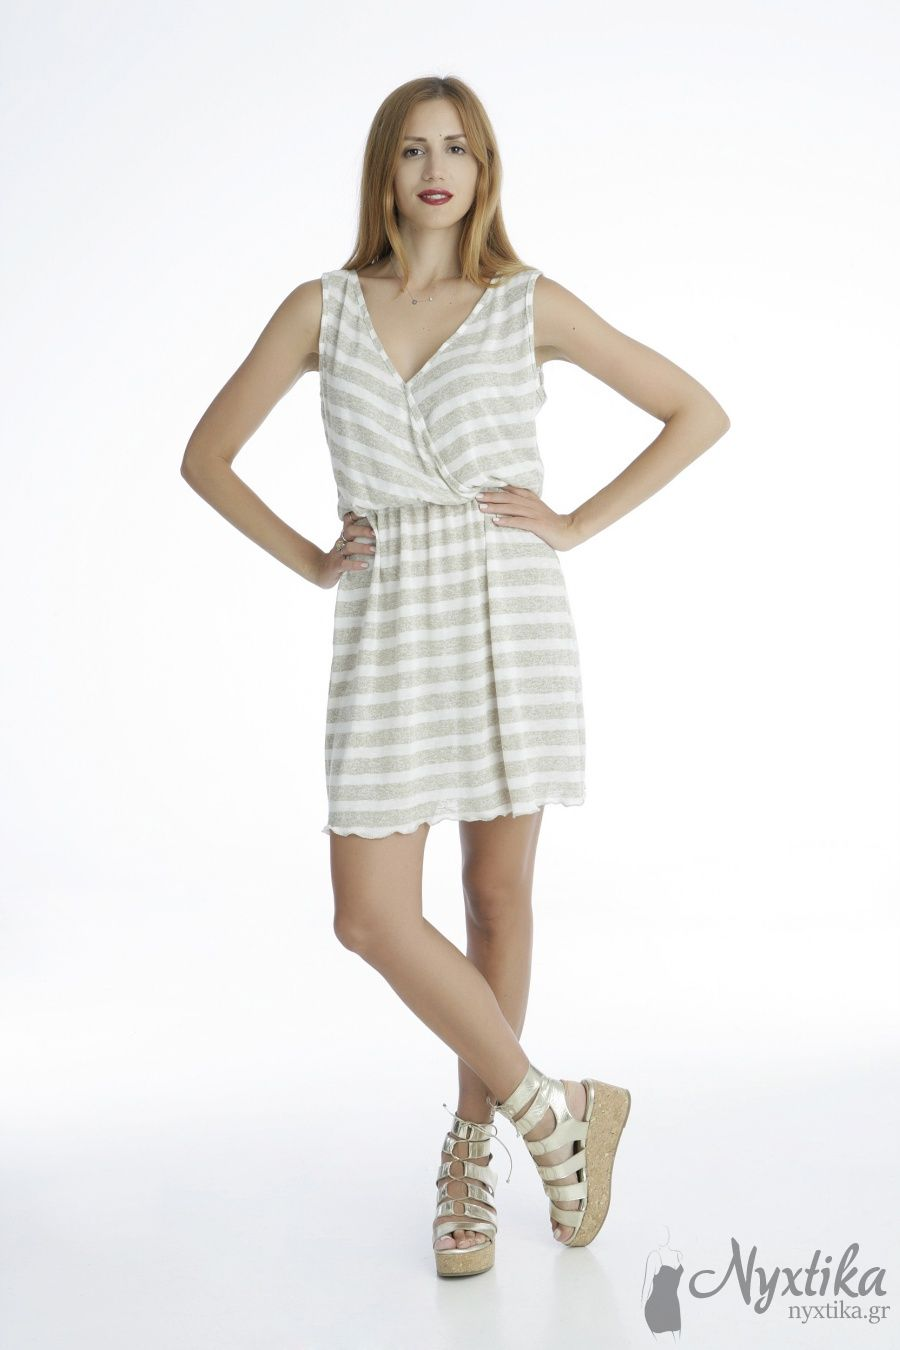 dffe5ead9ff Δροσερό Βαμβακερό φόρεμα παραλίας εγκυμοσύνης, μεγάλα μεγέθη